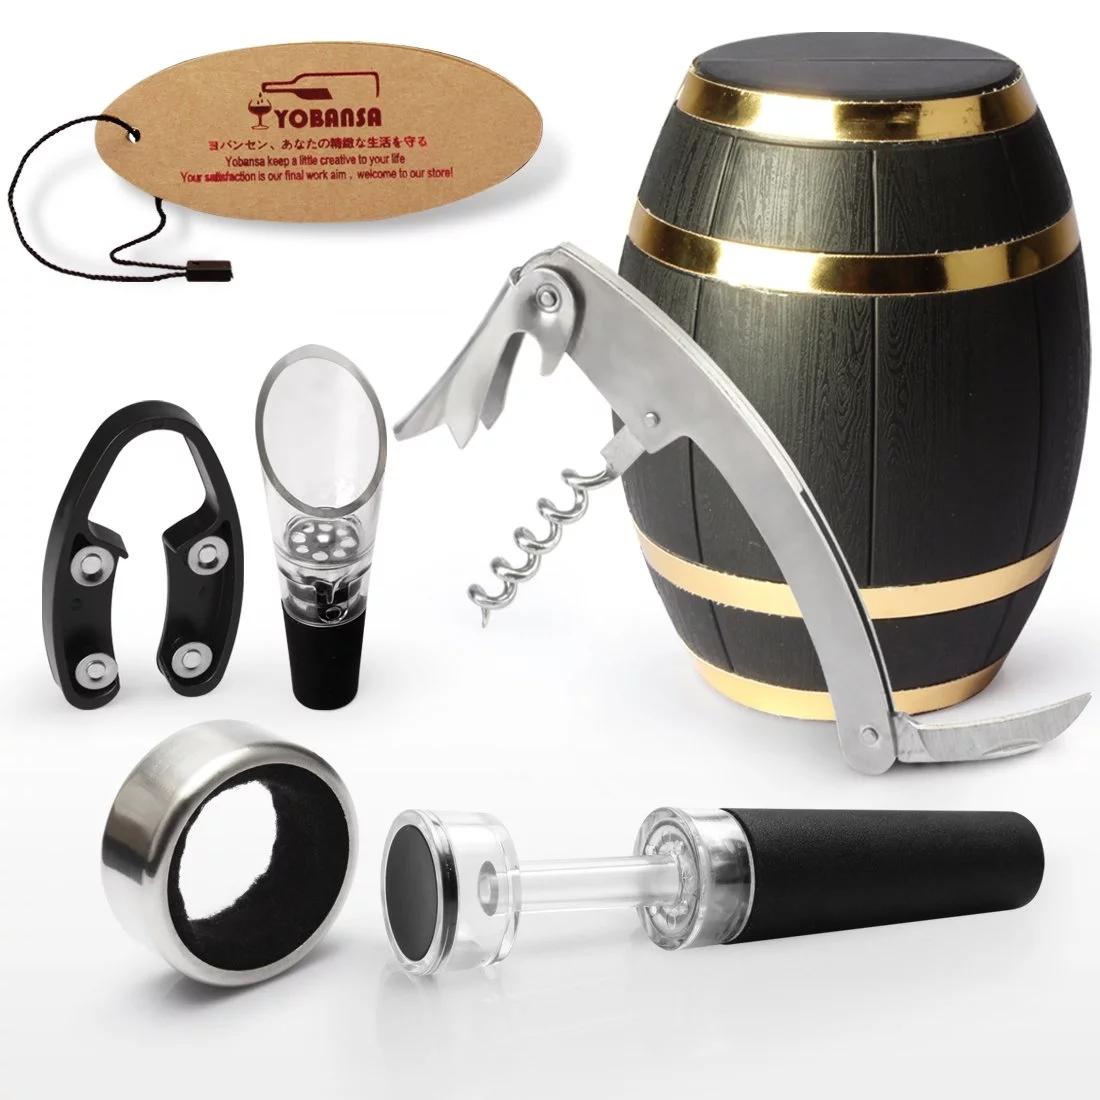 Manufactur standard Carrara Marble Mosaic - SHUNSTONE Hot Sale Wine Barrel Shaped Wine Accessories Gift Set Wine Opener Corkscrew – Shunstone